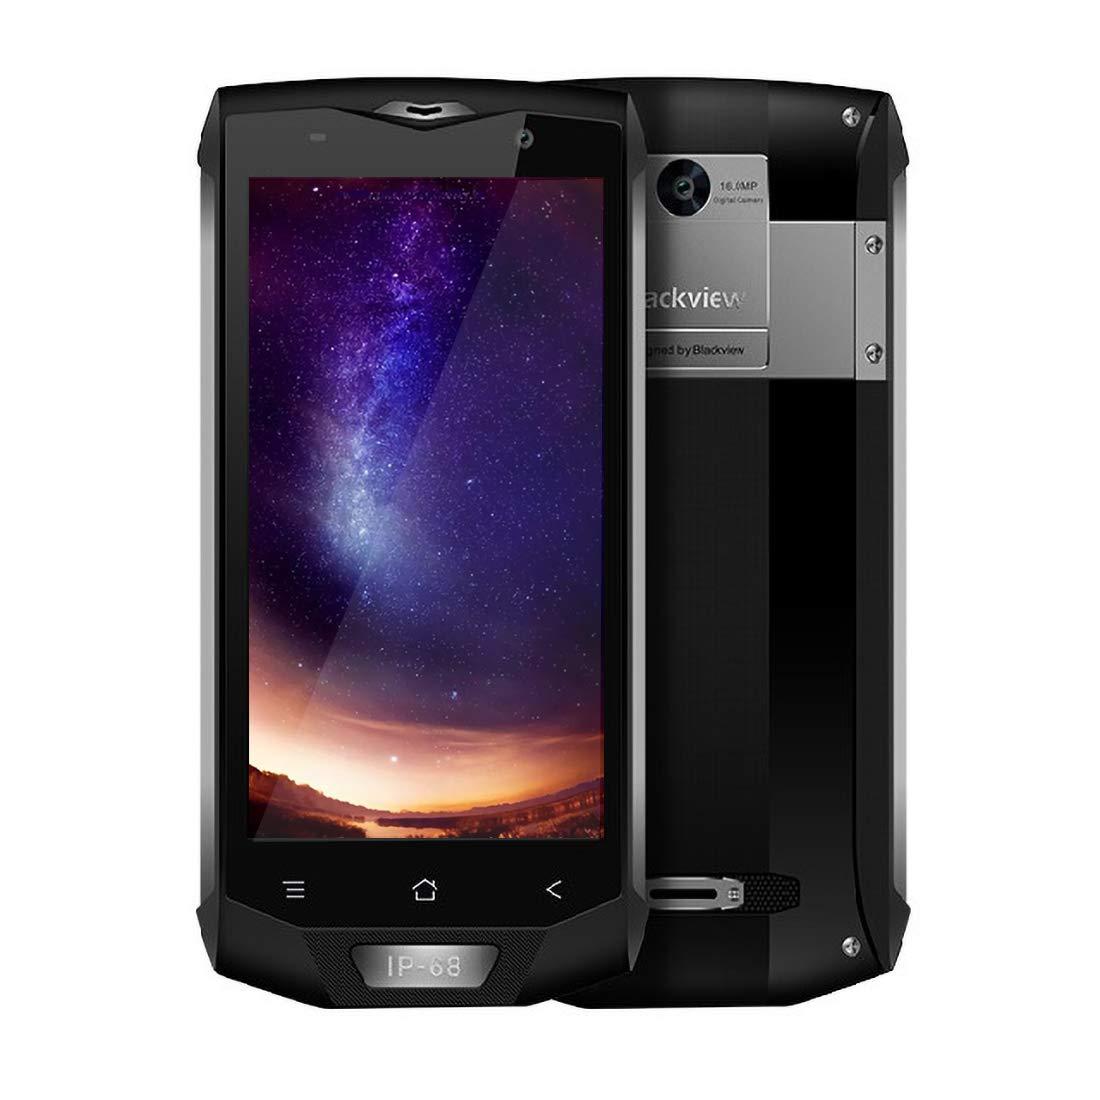 Unlocked Cell Phone, Blackview BV8000 Pro Rugged Smartphone Work on  AT&T/Tmobile IP68 Waterproof 4G LTE Dual Sim 6GB Ram+64GB ROM Dual Camera  5 0